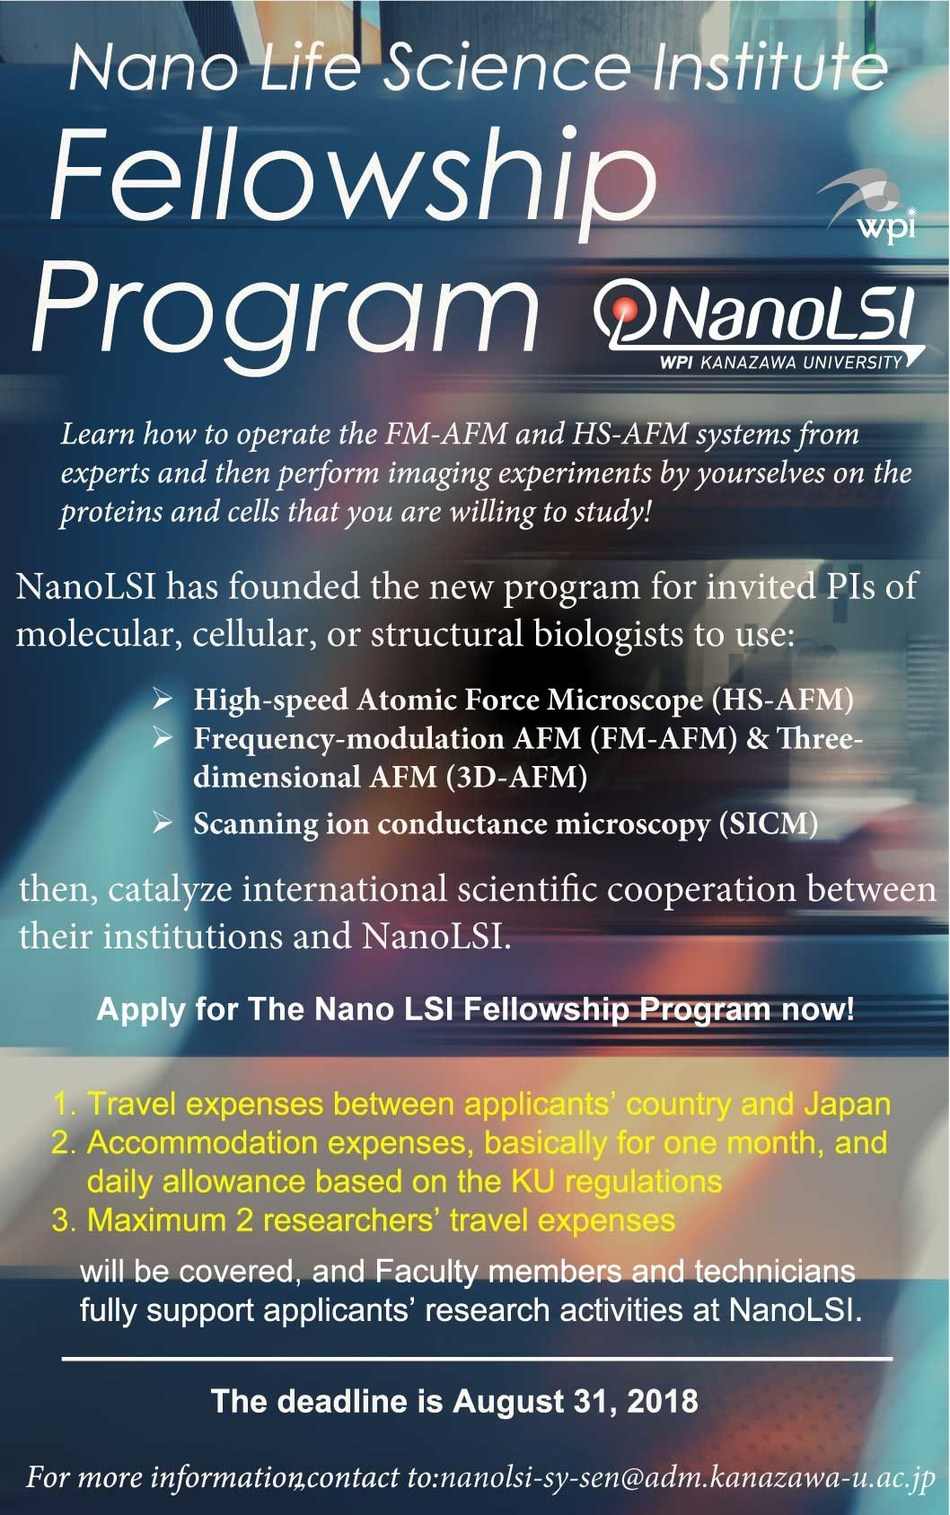 Flyer for the Fellowship program NanoLSI Fellowship Program (PRNewsfoto/Kanazawa University)